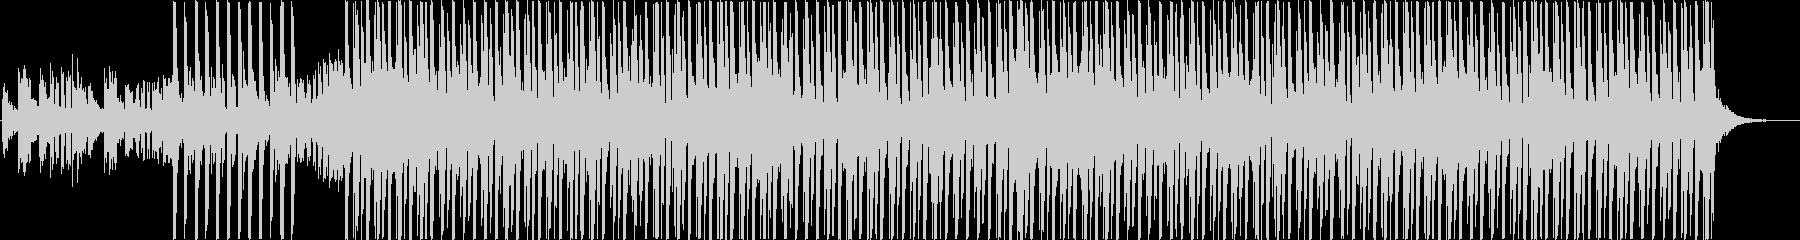 A modern BGM with an impressive vocal chop's unreproduced waveform